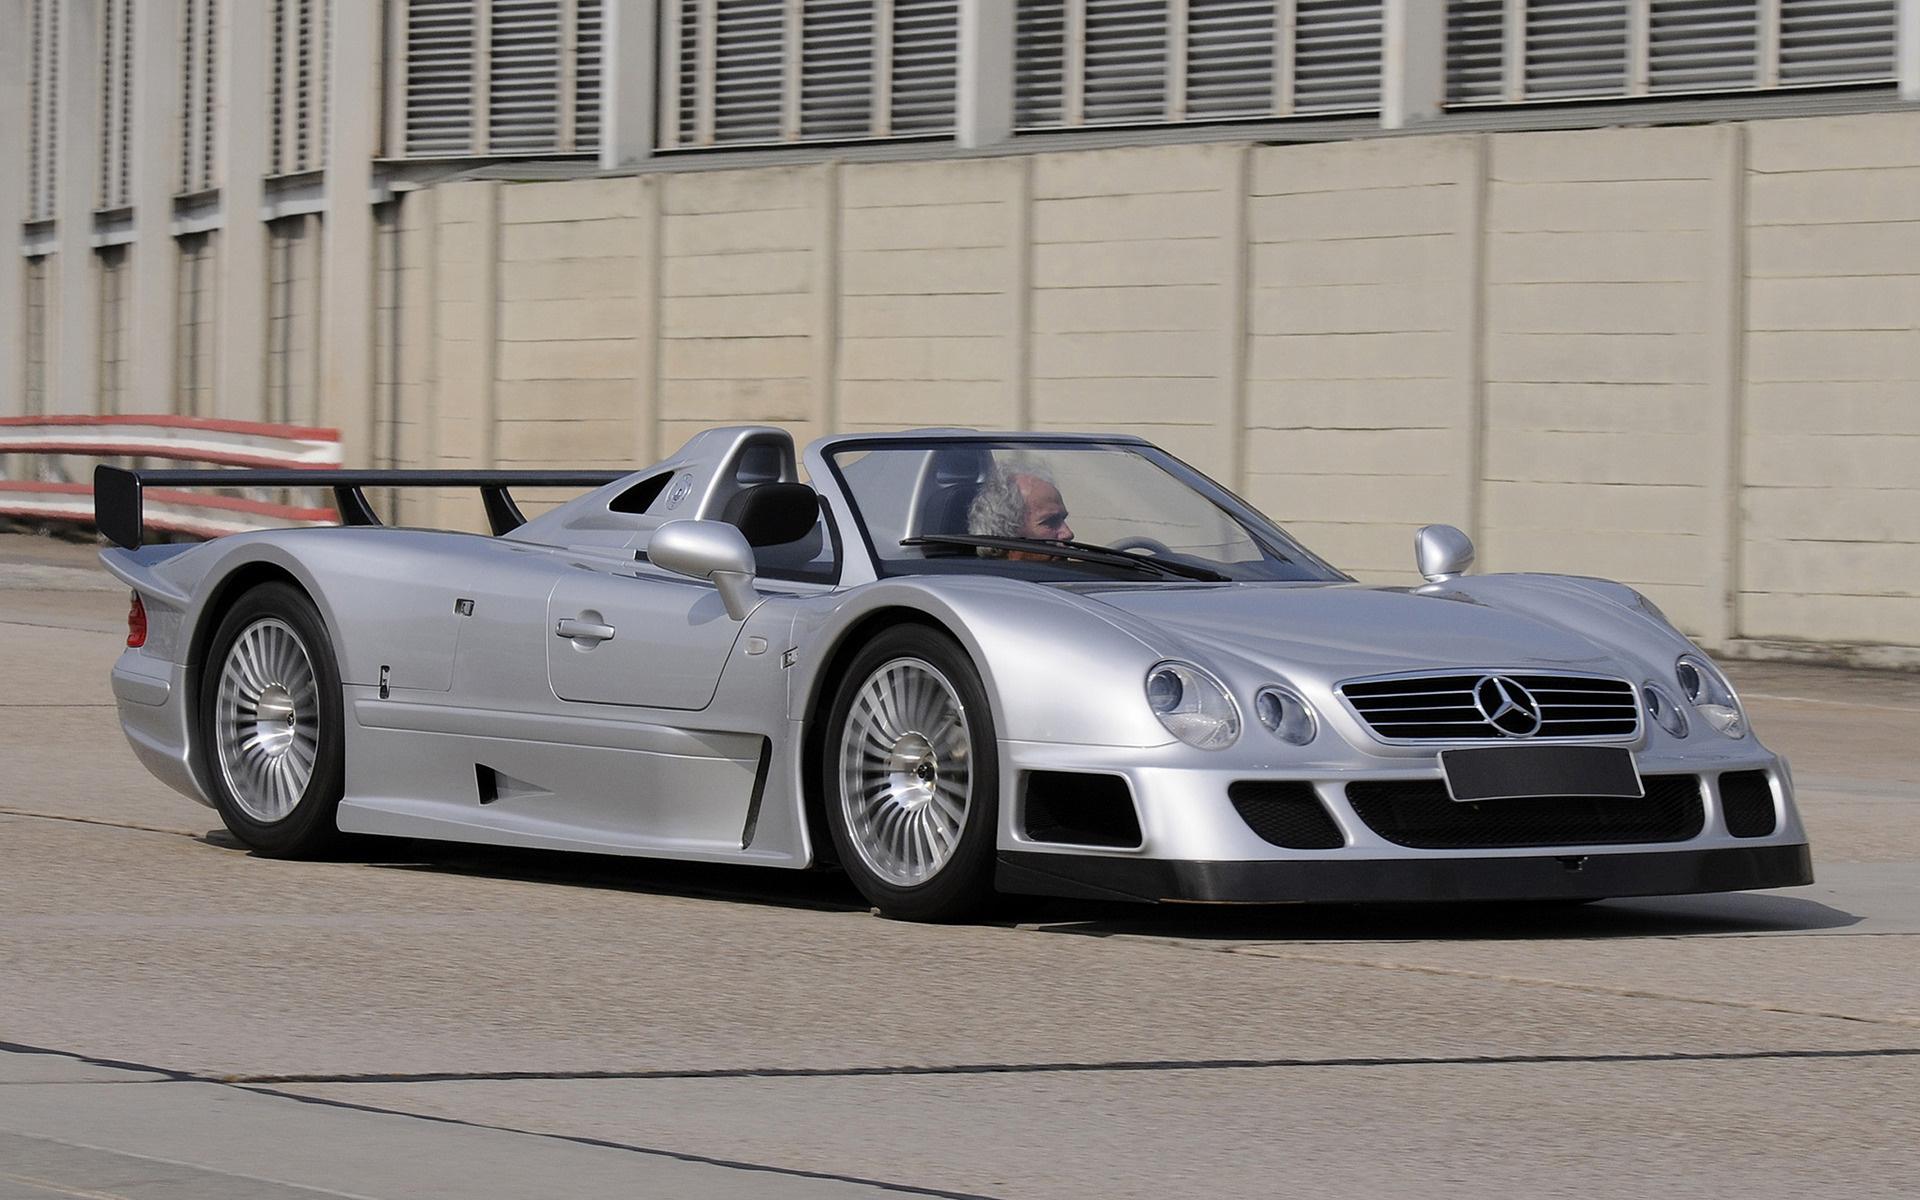 Mercedes Benz Amg >> Mercedes-Benz CLK GTR Roadster (1998) Wallpapers and HD Images - Car Pixel